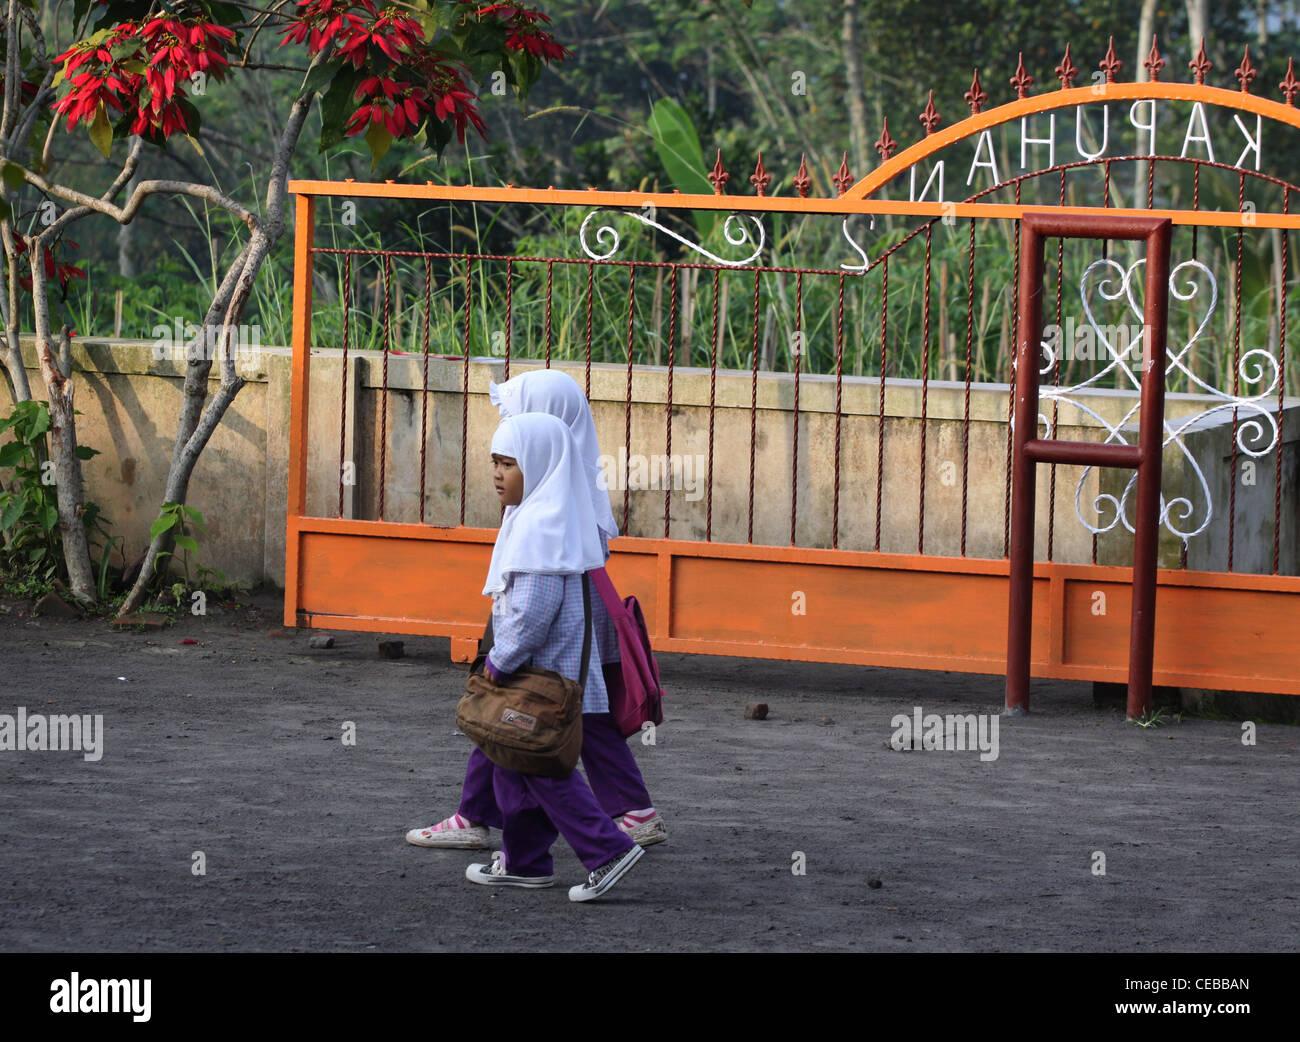 school children village Yogyakarta Indonesia - Stock Image